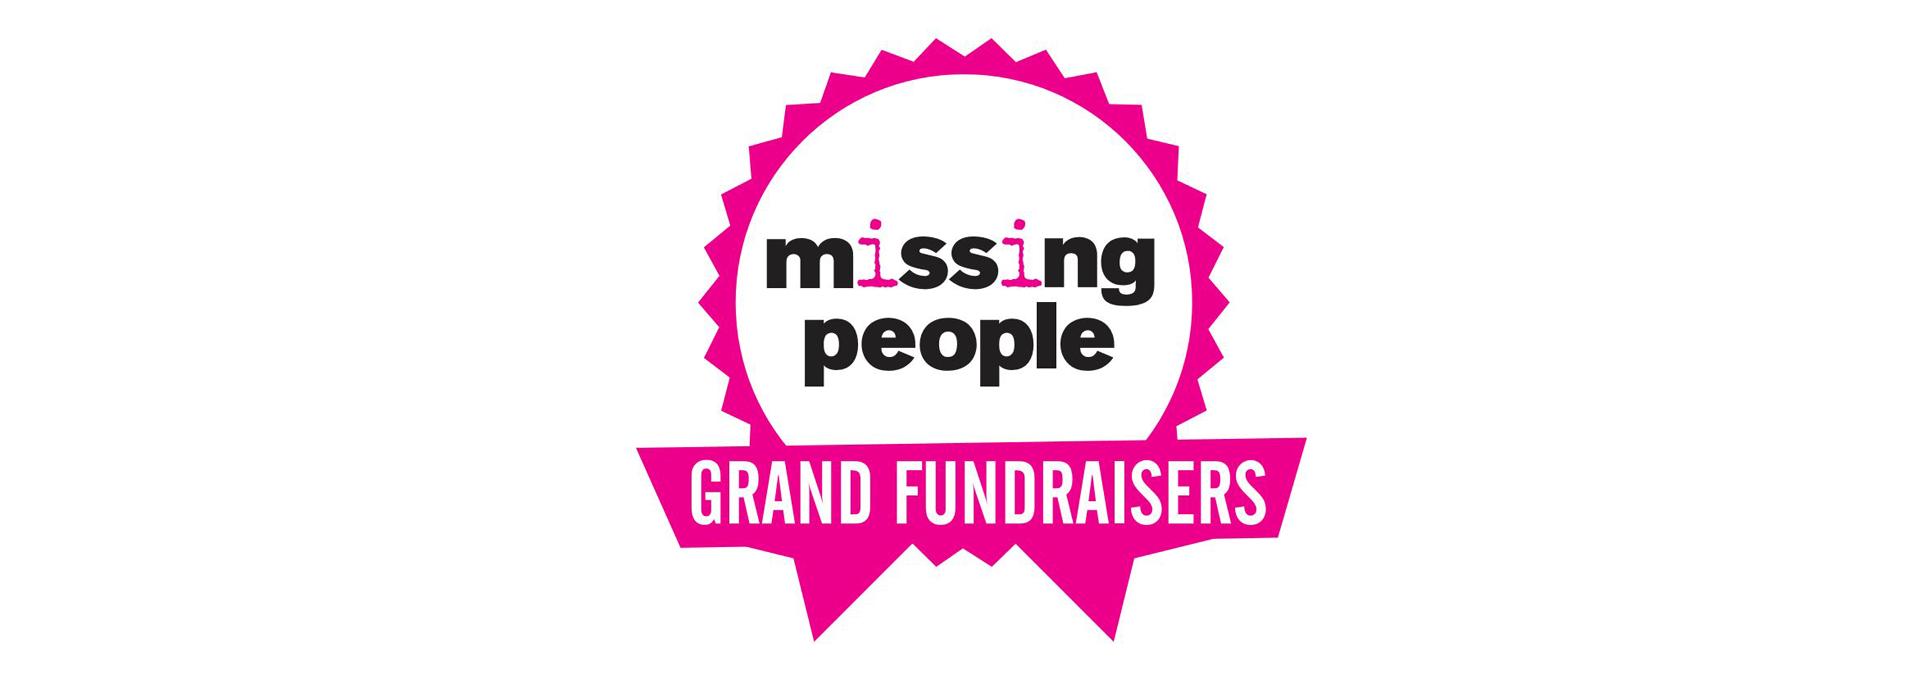 Grand fundraisers logo